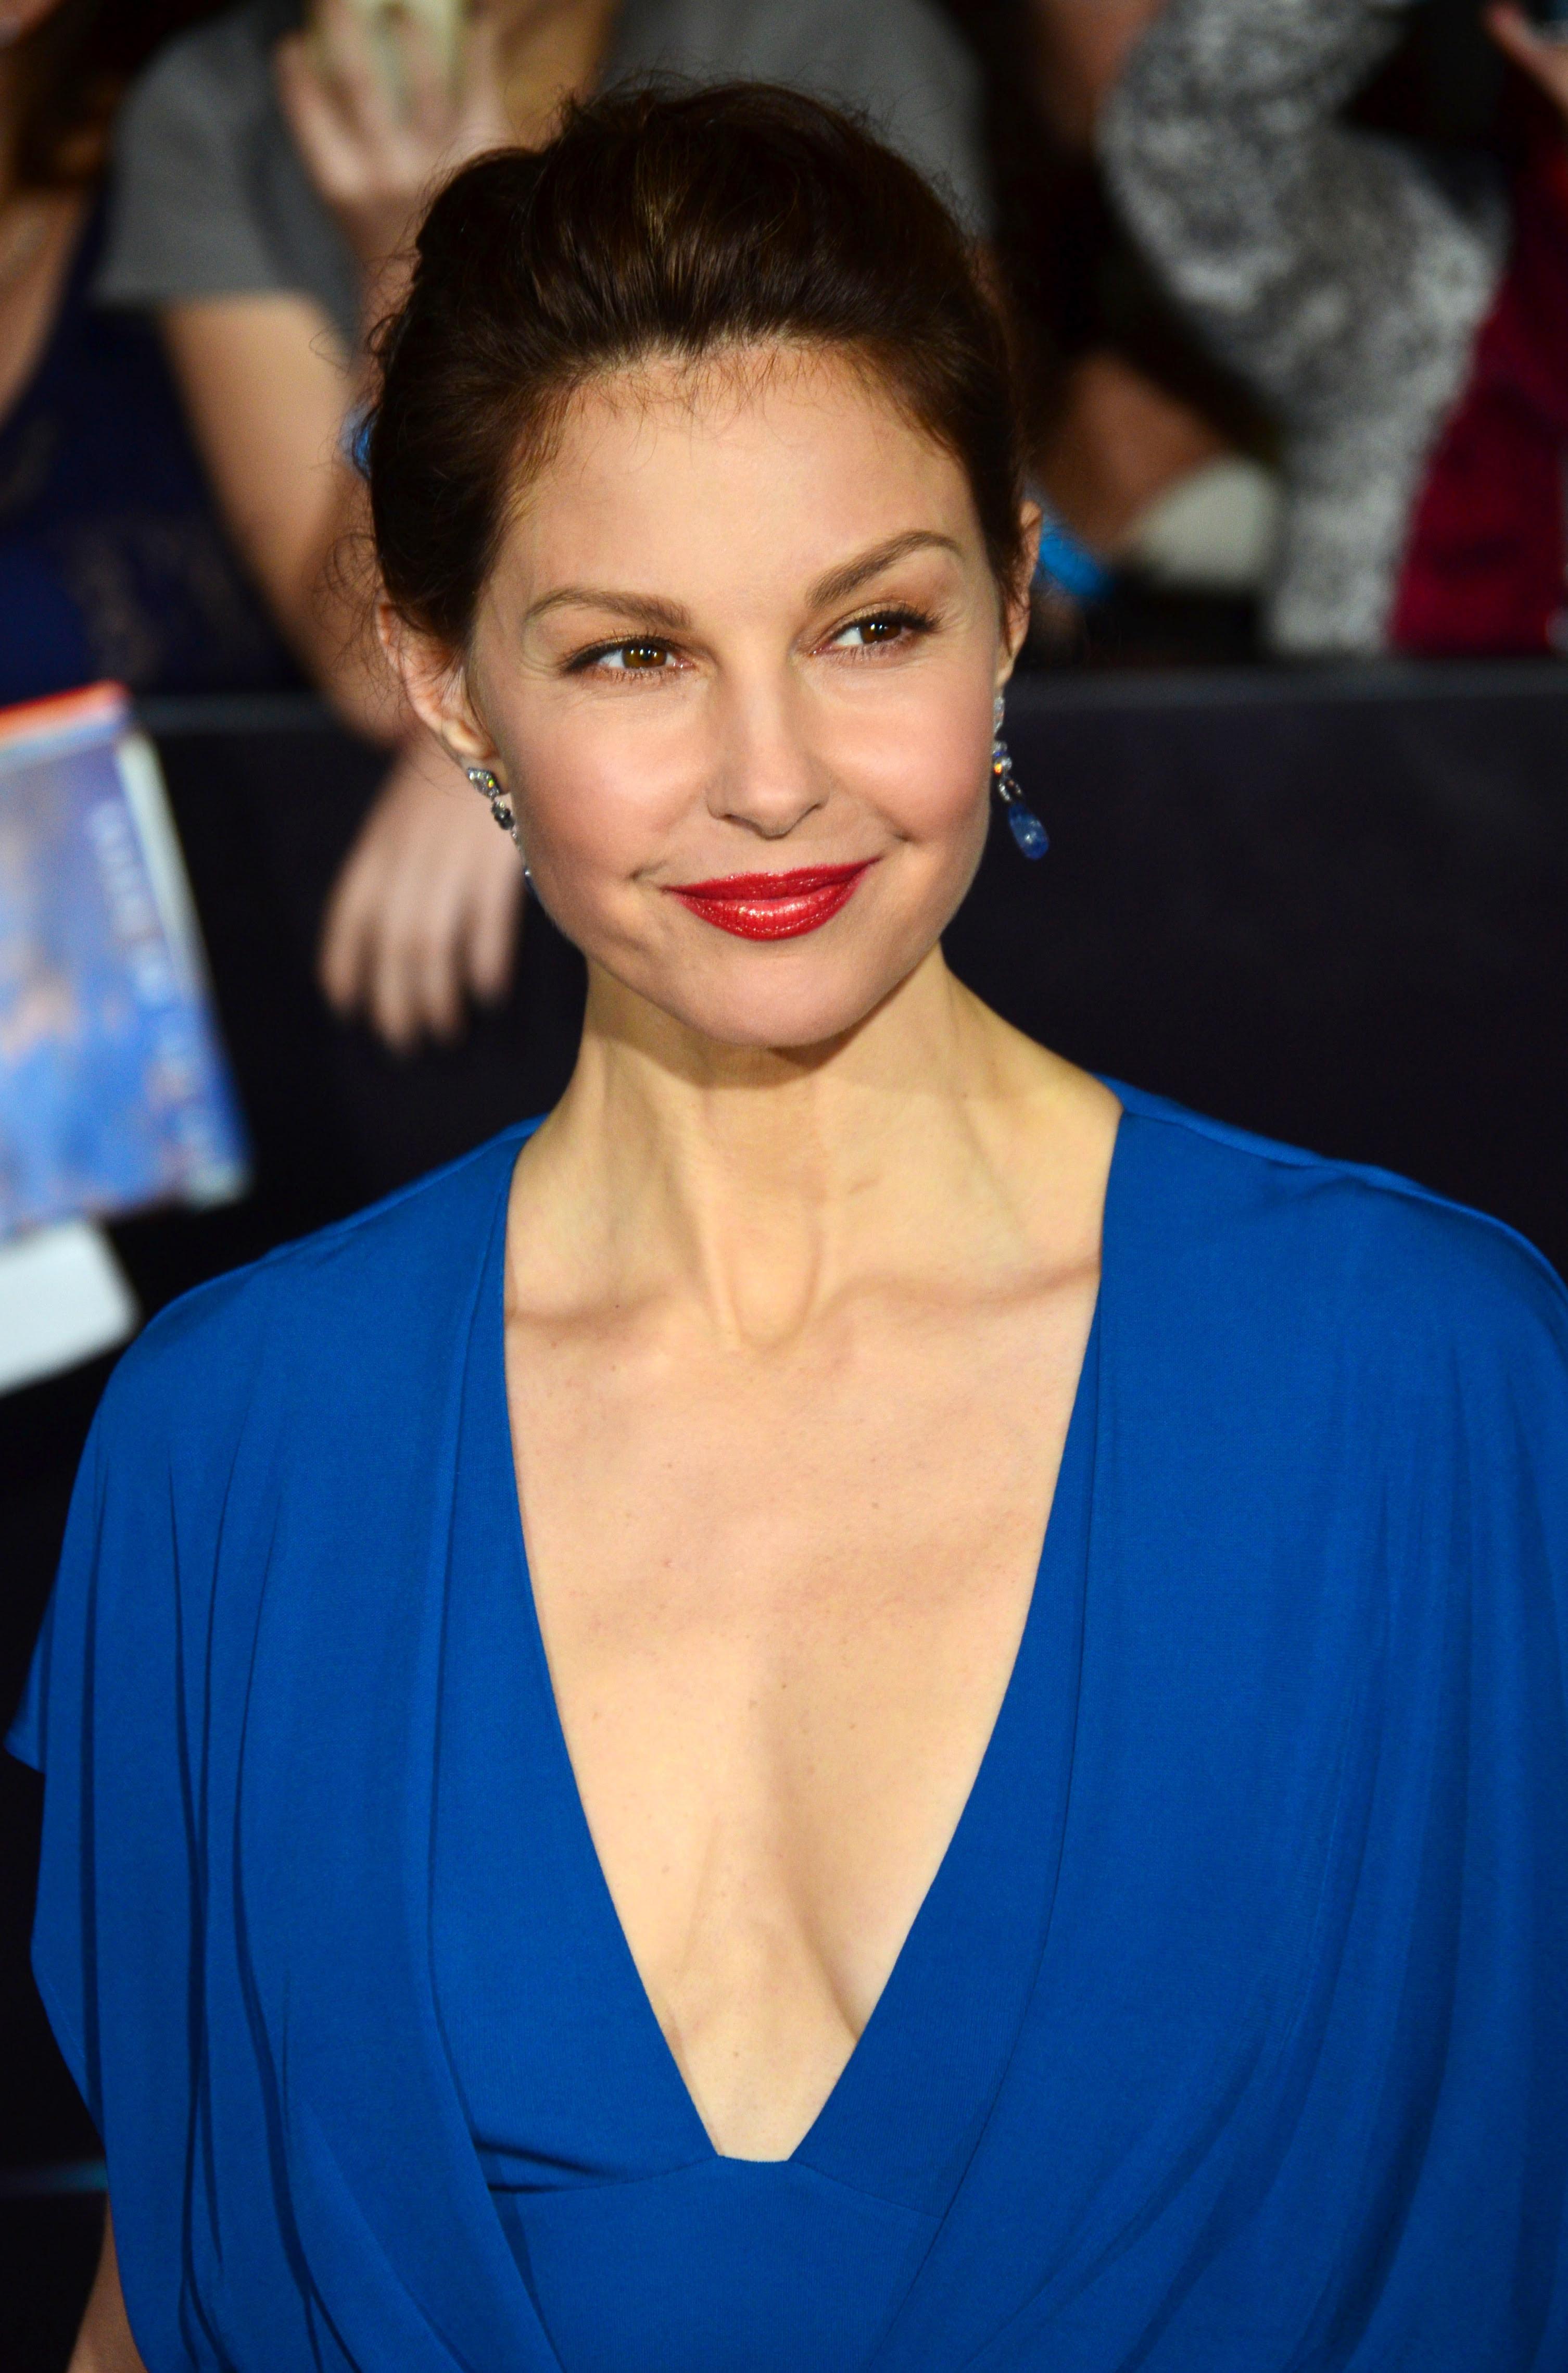 http://upload.wikimedia.org/wikipedia/commons/0/06/Ashley_Judd_2014.jpg